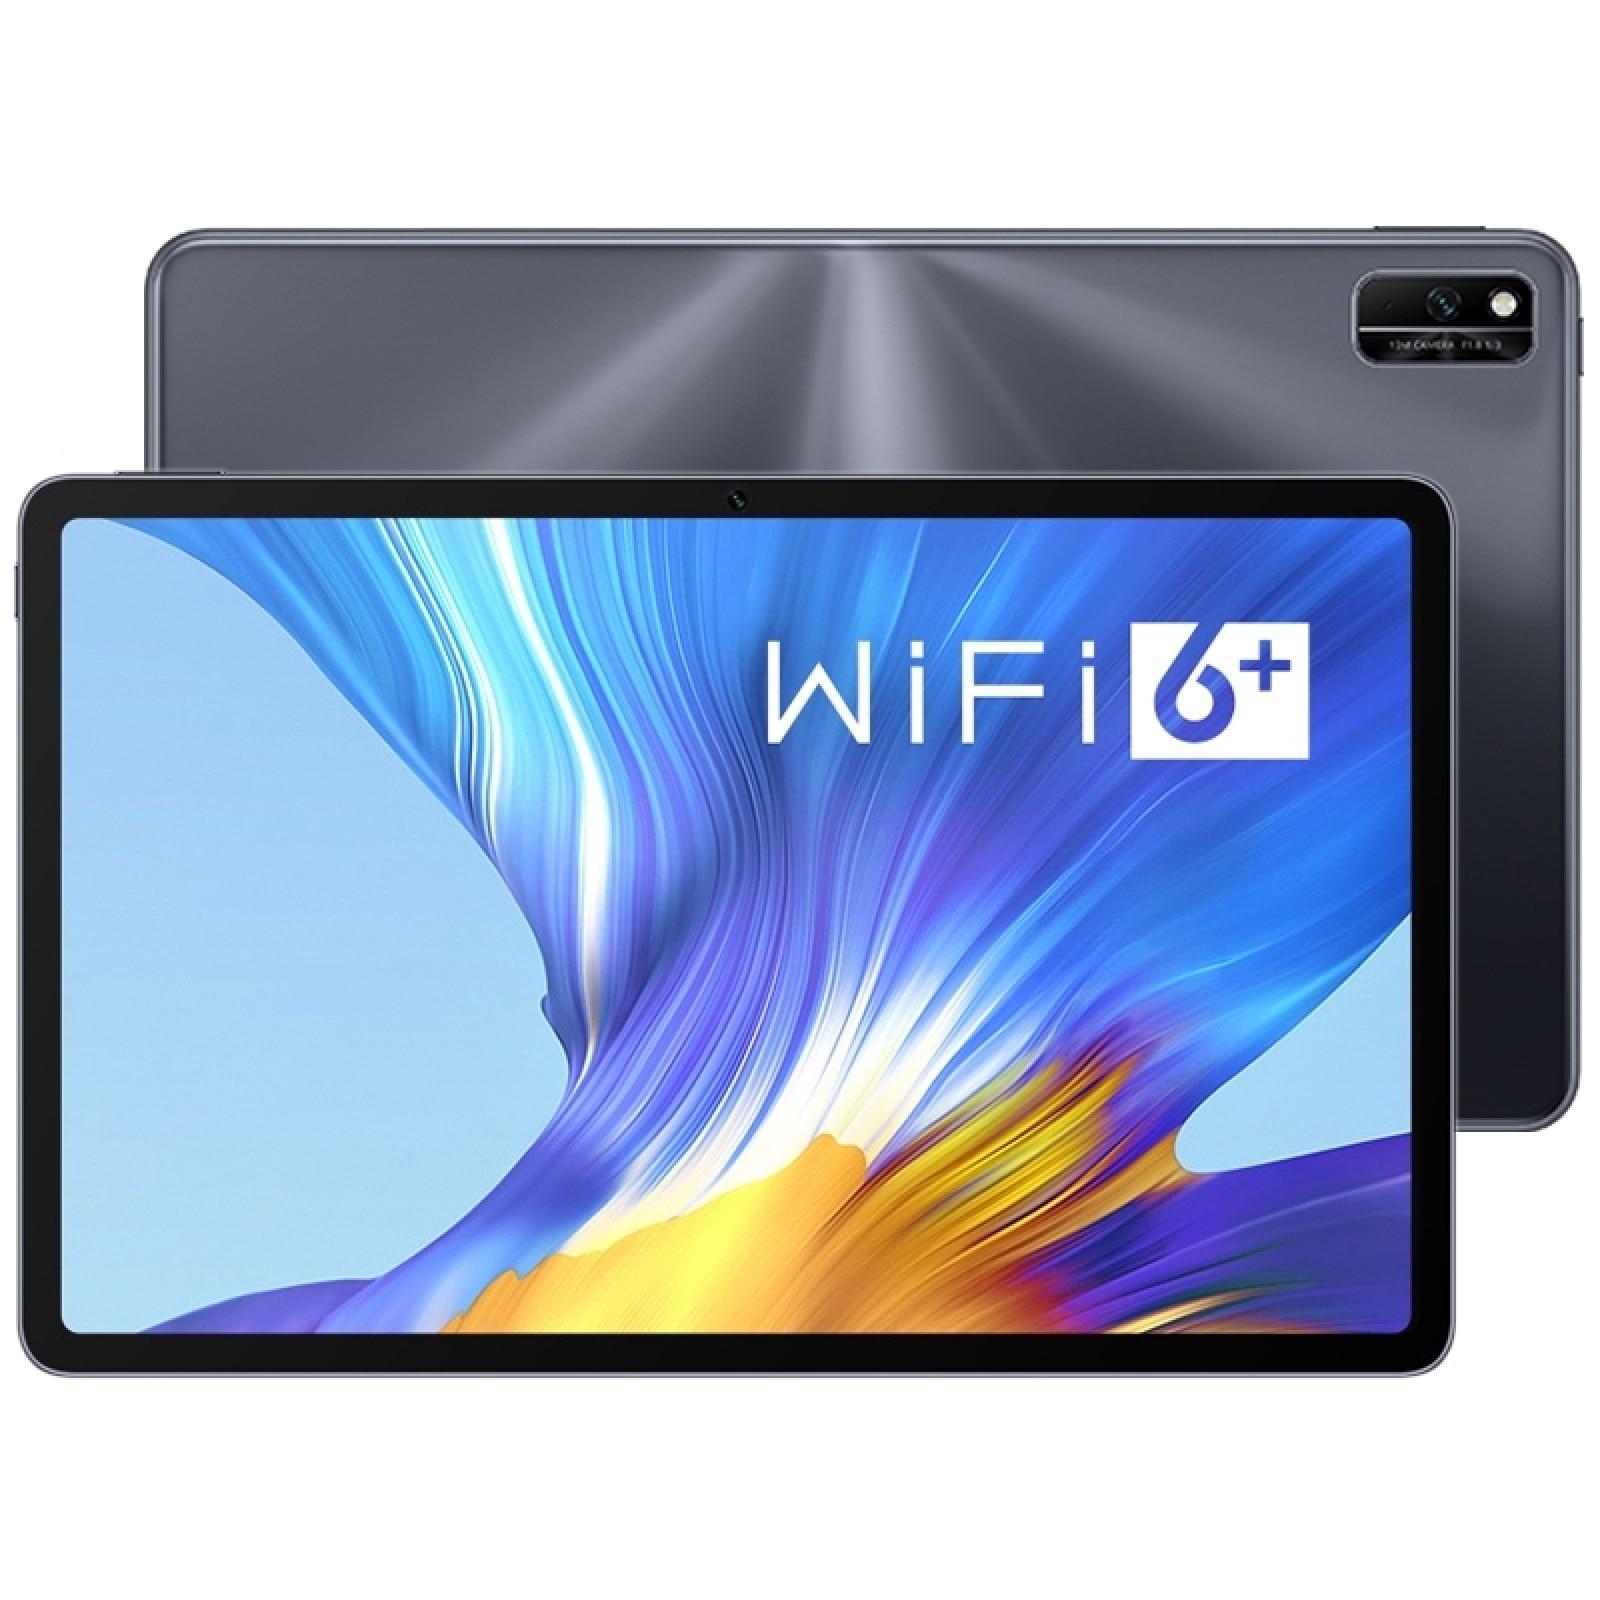 Huawei Honor V6 KRJ-W09 Wifi6+ 10.4 inch 6GB RAM 64GB ROM Magic UI 3.1(Android 10.1) Hisilicon Kirin 985 Octa Core Tablet PC